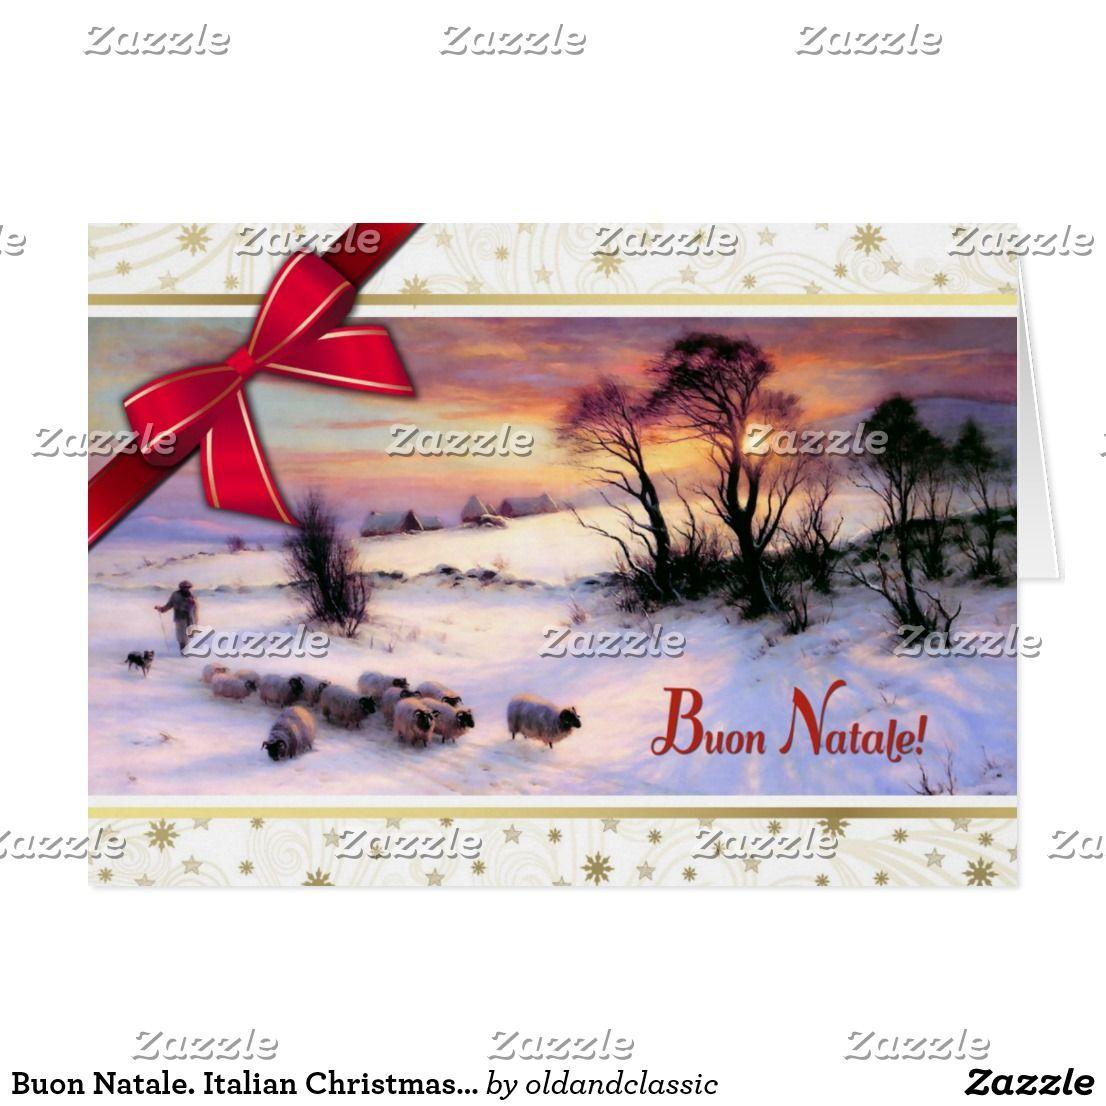 Buon natale italian christmas cards natale pinterest natale italian christmas cards kristyandbryce Images